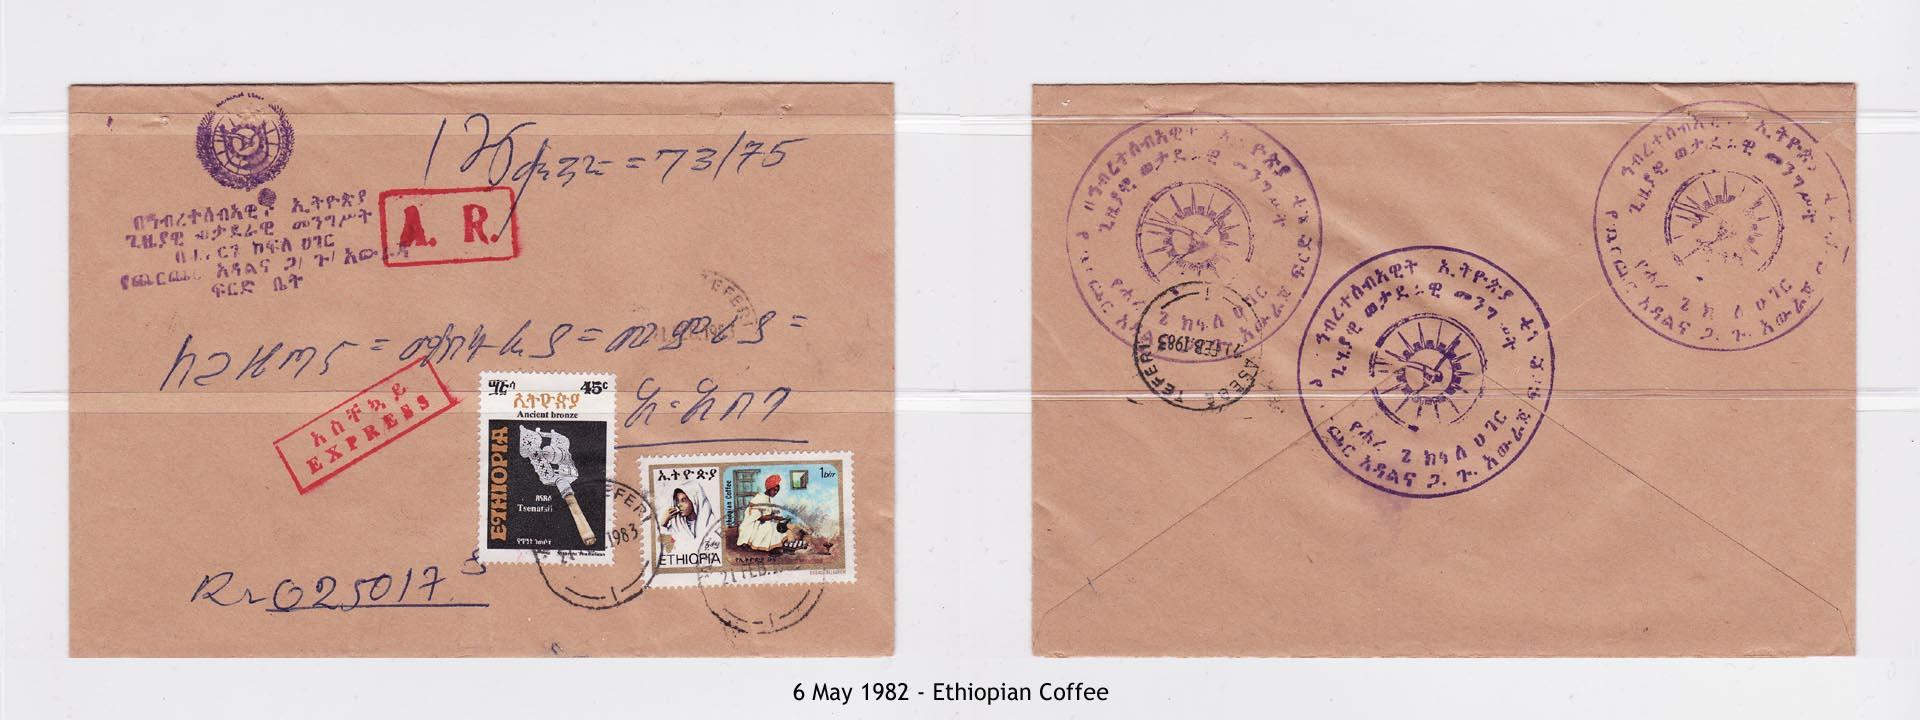 19820506 - Ethiopian Coffee